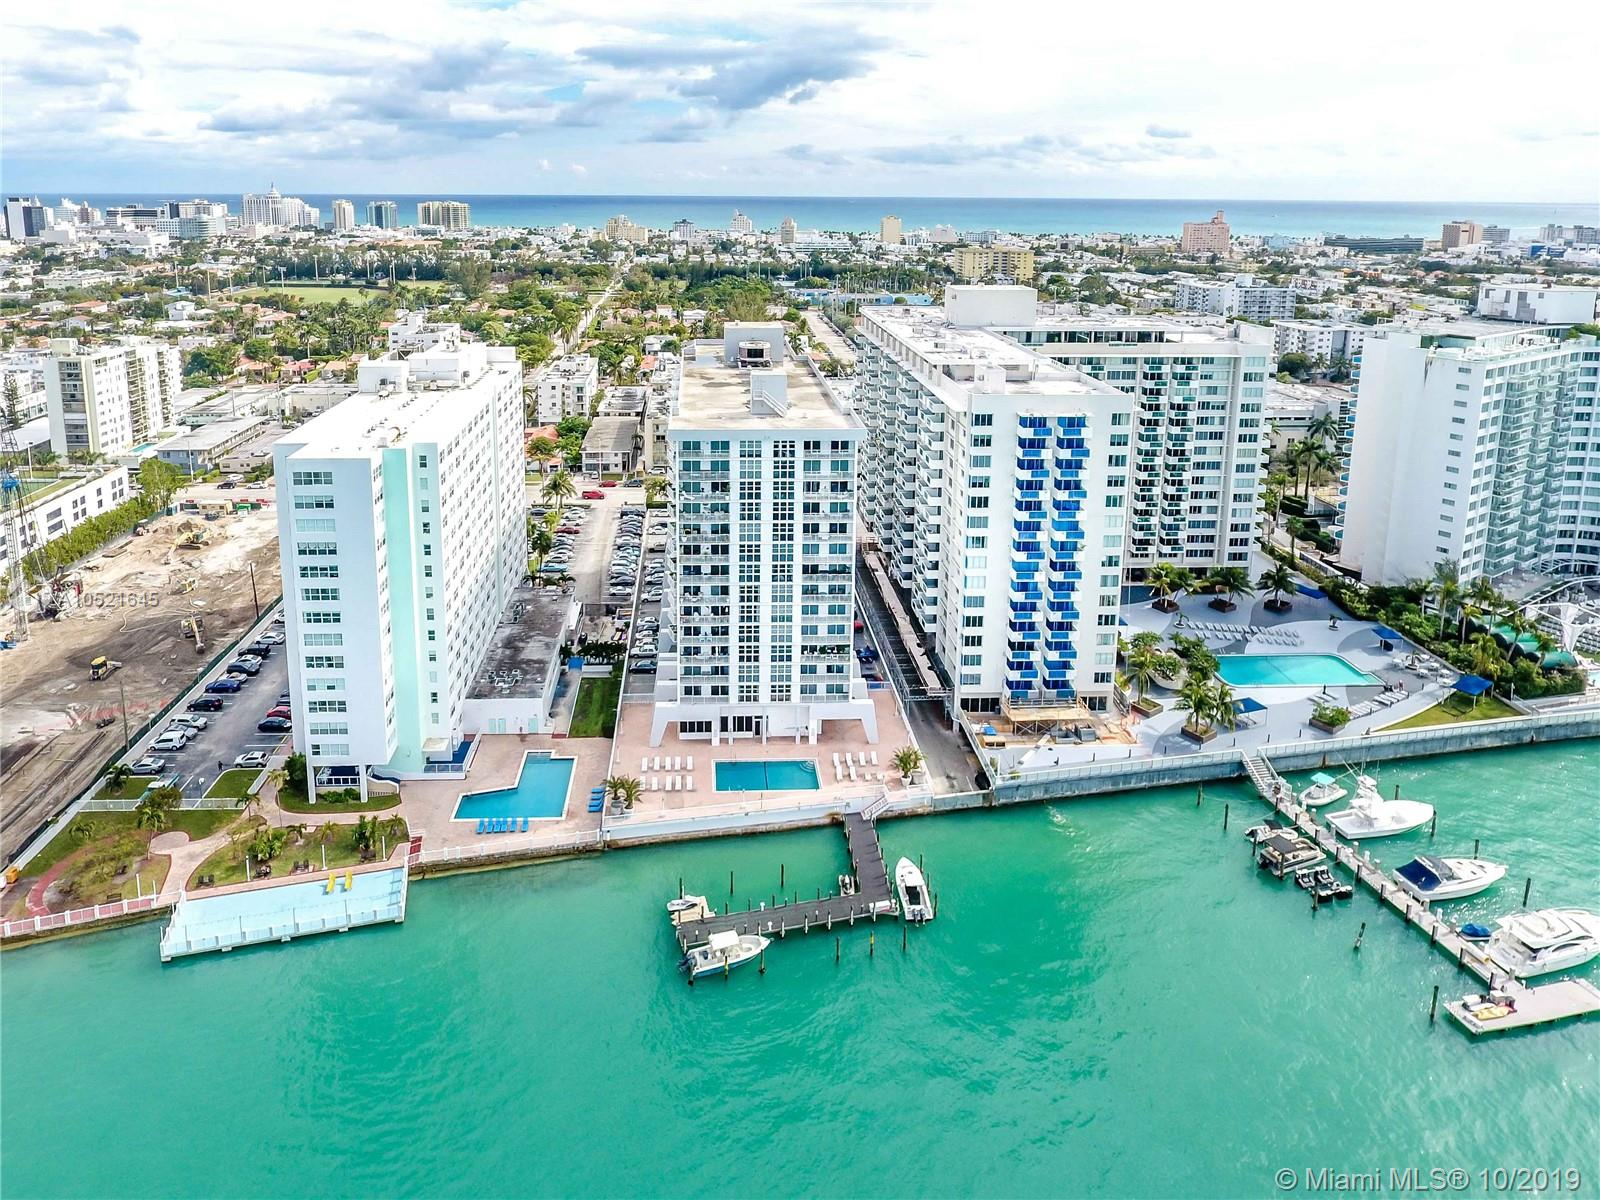 1228 West Ave, 210 - Miami Beach, Florida